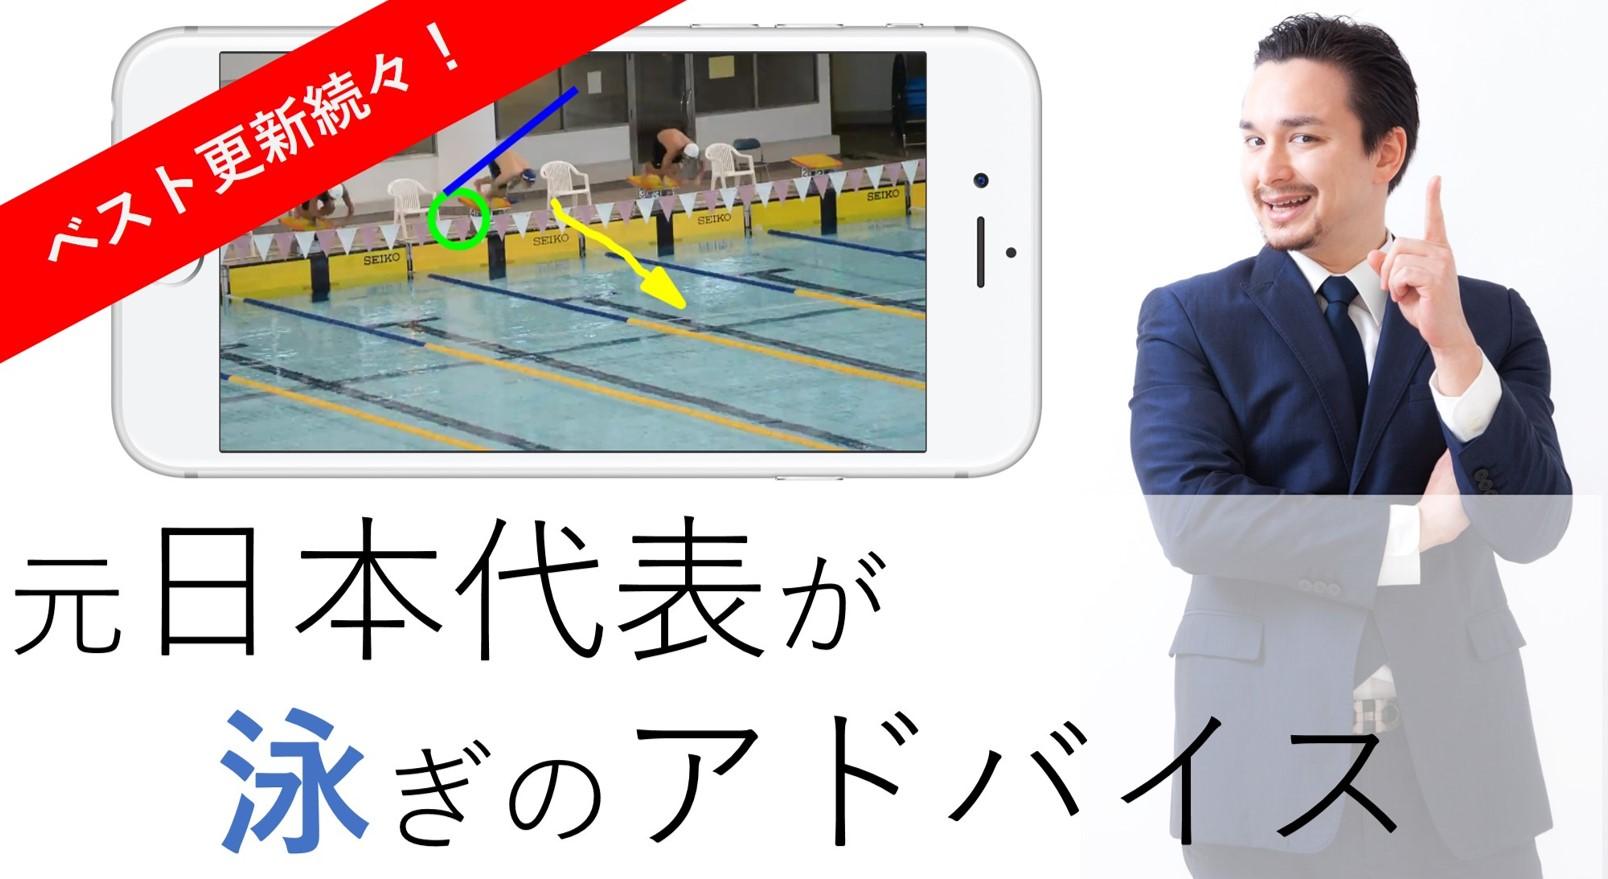 swimsupport_banner